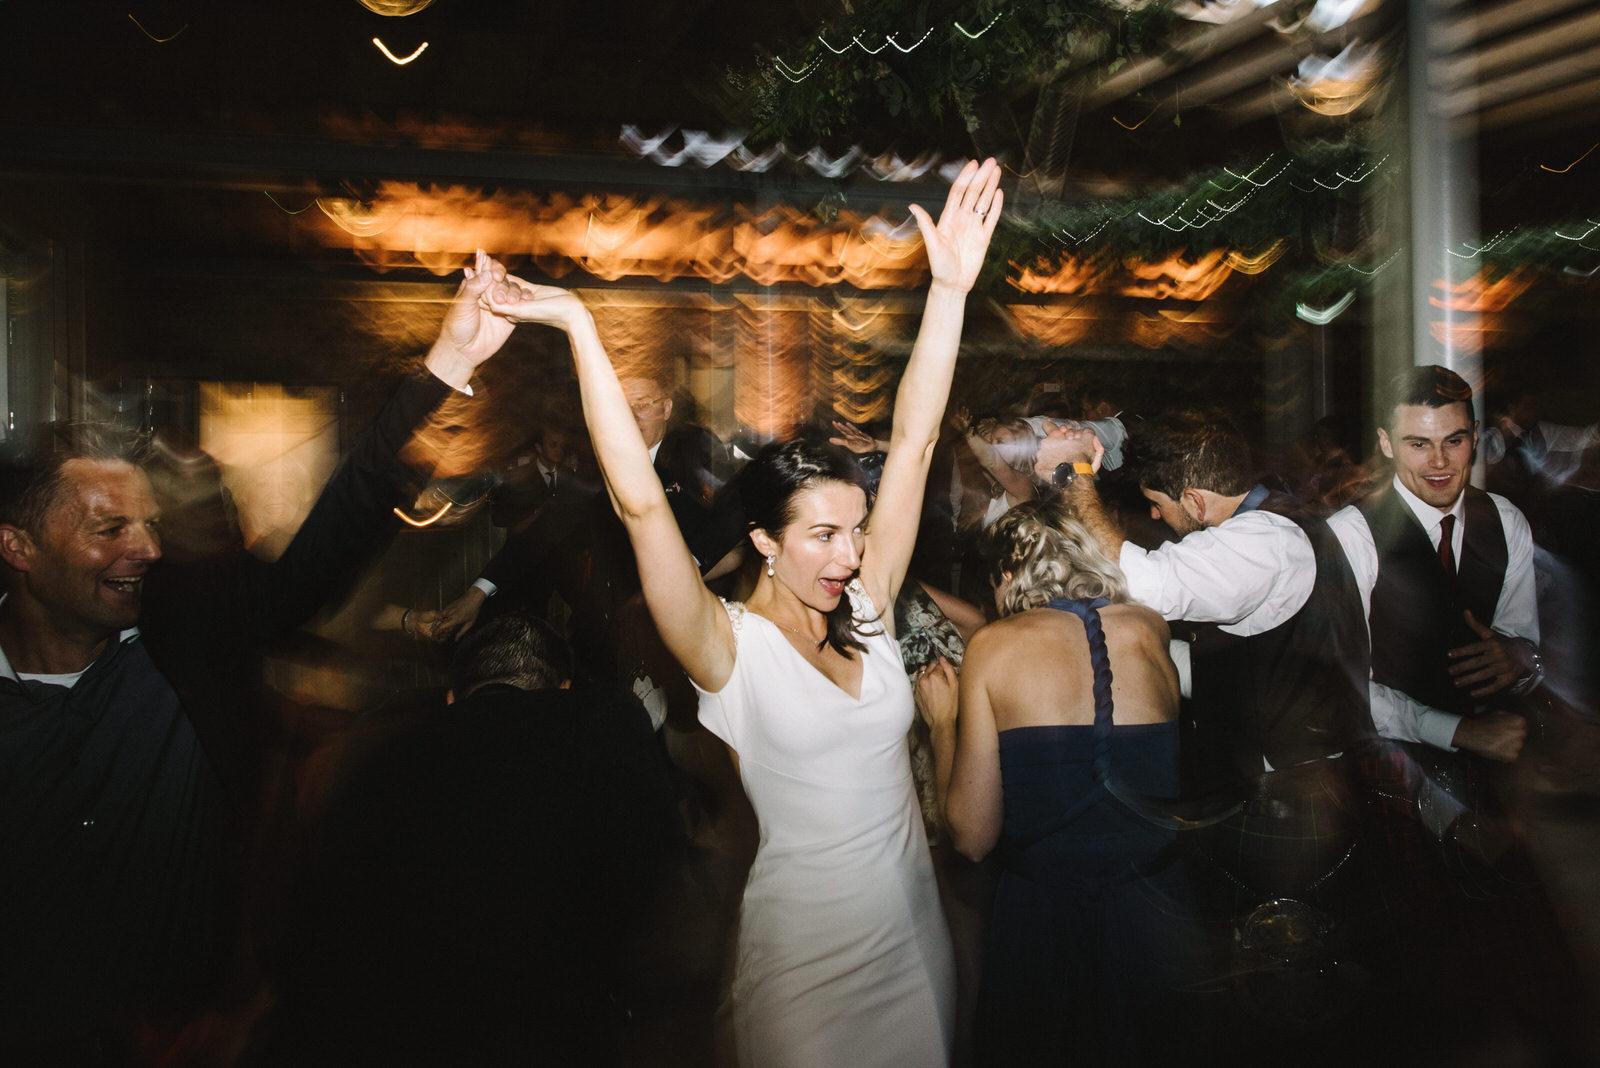 068-GUARDSWELL-FARM-WEDDING-ALTERNATIVE-SCOTTISH-WEDDING-PHOTOGRAPHER-SCOTTISH-WEDDING-DESTINATION-WEDDING-PHOTOGRAPHER.JPG